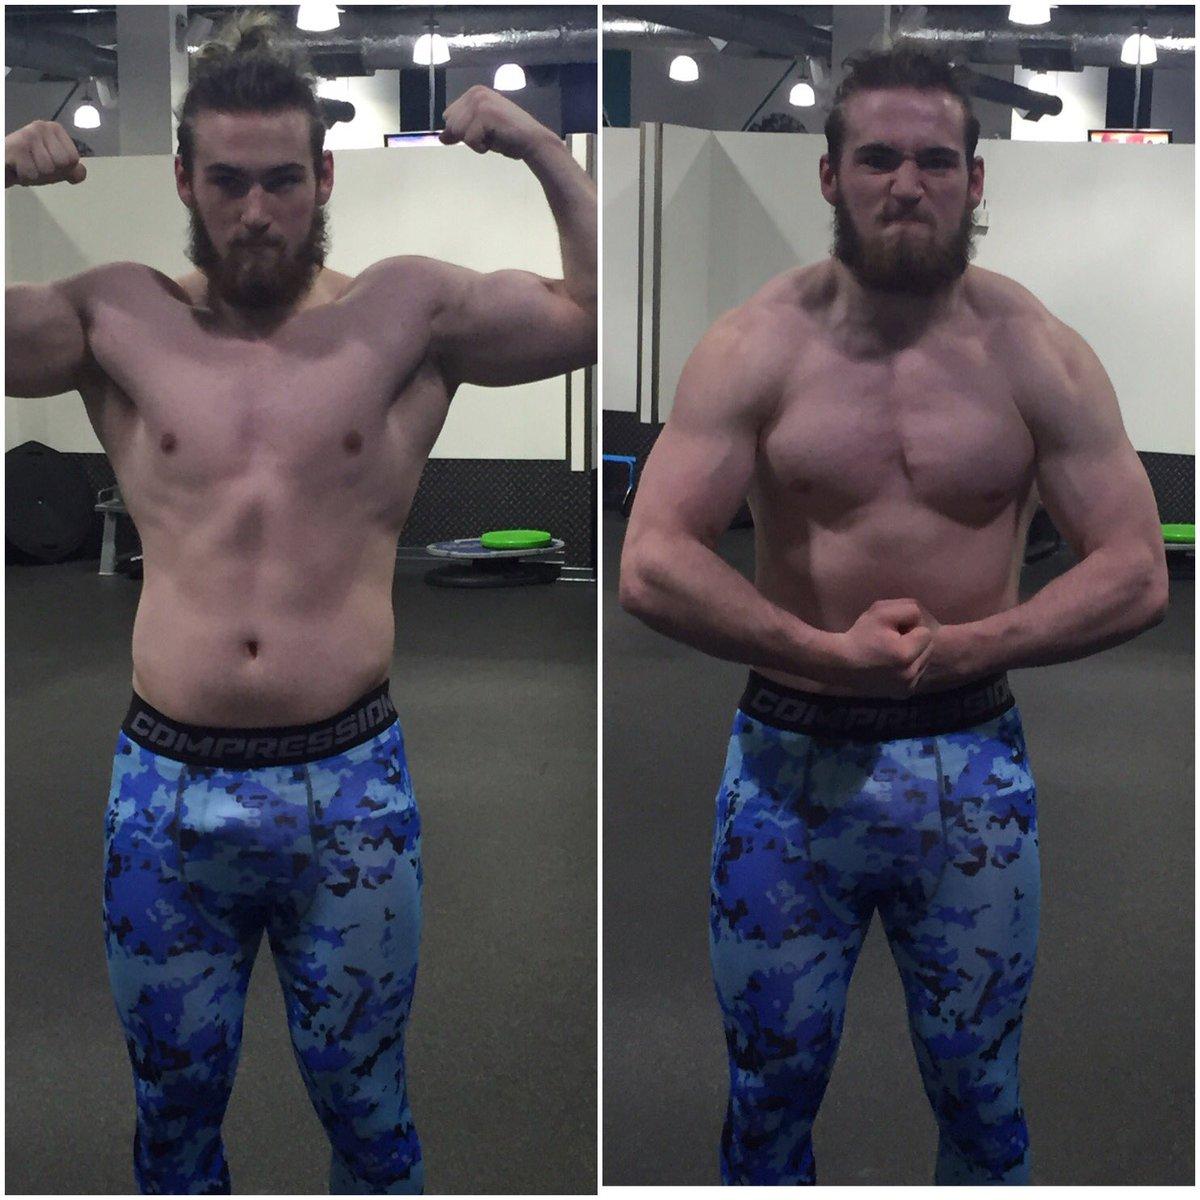 Motivation. Determination. Obsession. #Bodybuilding #Powerlifting #ProWrestling #Fitness #PureGym #Pride #MyTimeToShine #FollowTheJourney<br>http://pic.twitter.com/YfoZsvaKqV